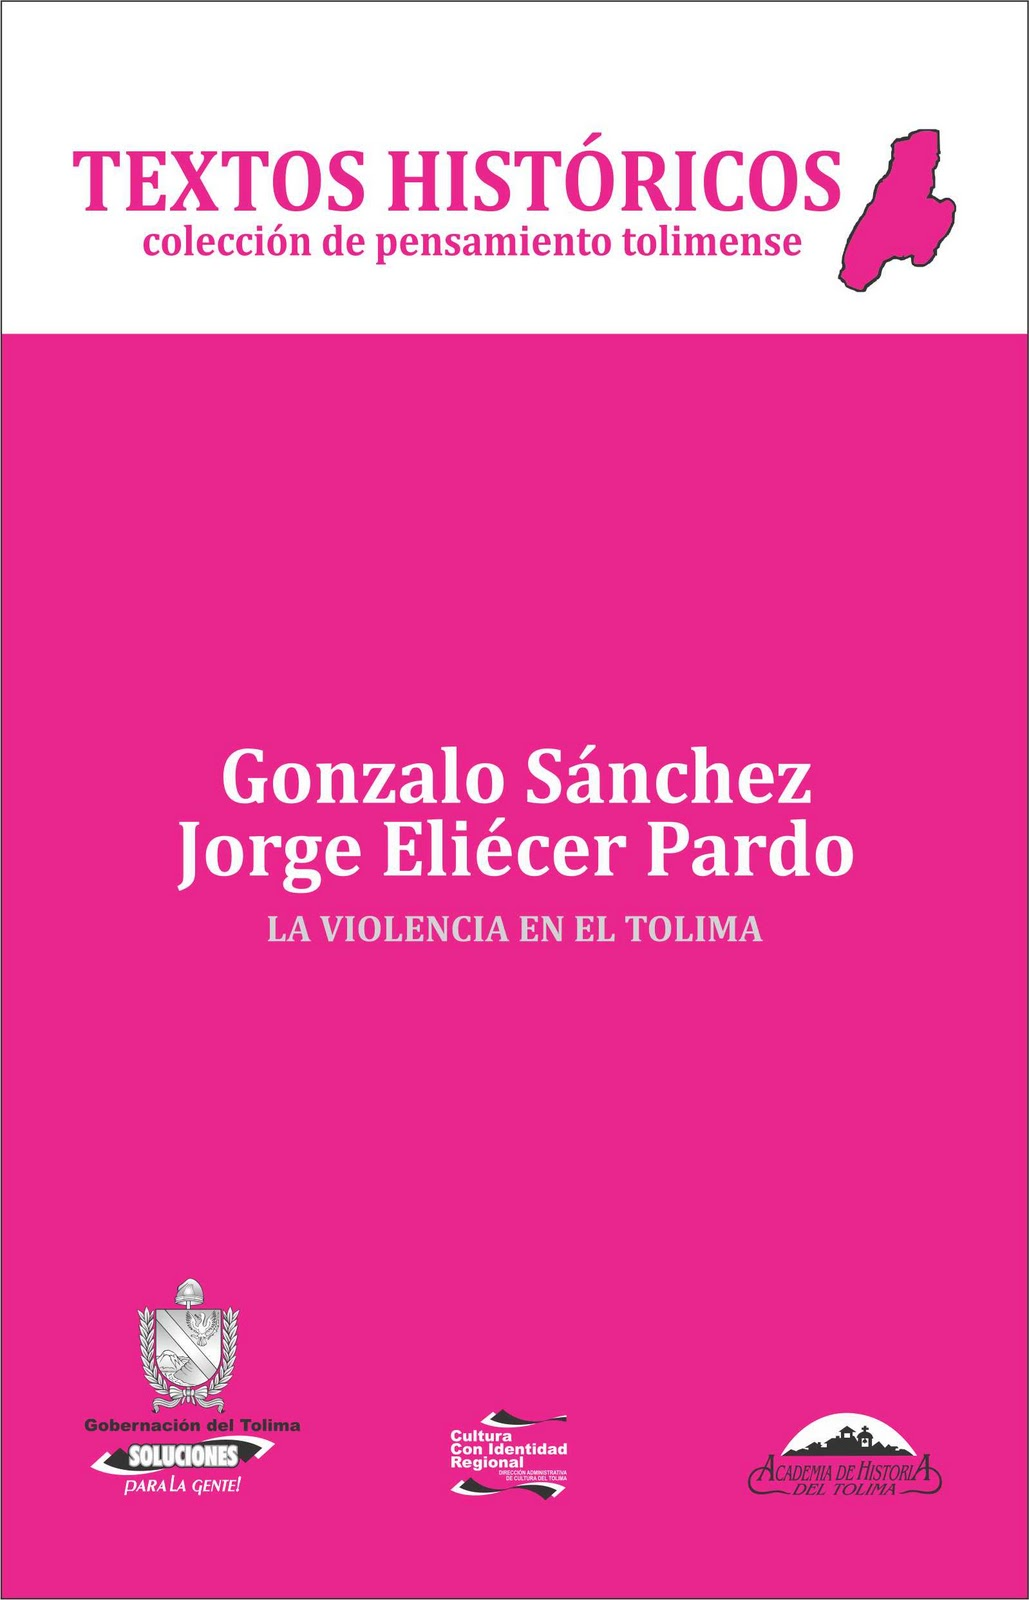 http://3.bp.blogspot.com/-huCzDeq76aU/Trfob3aVd8I/AAAAAAAADHs/PMlRNtGlEFE/s1600/Gonzalo+Sanchez.jpg